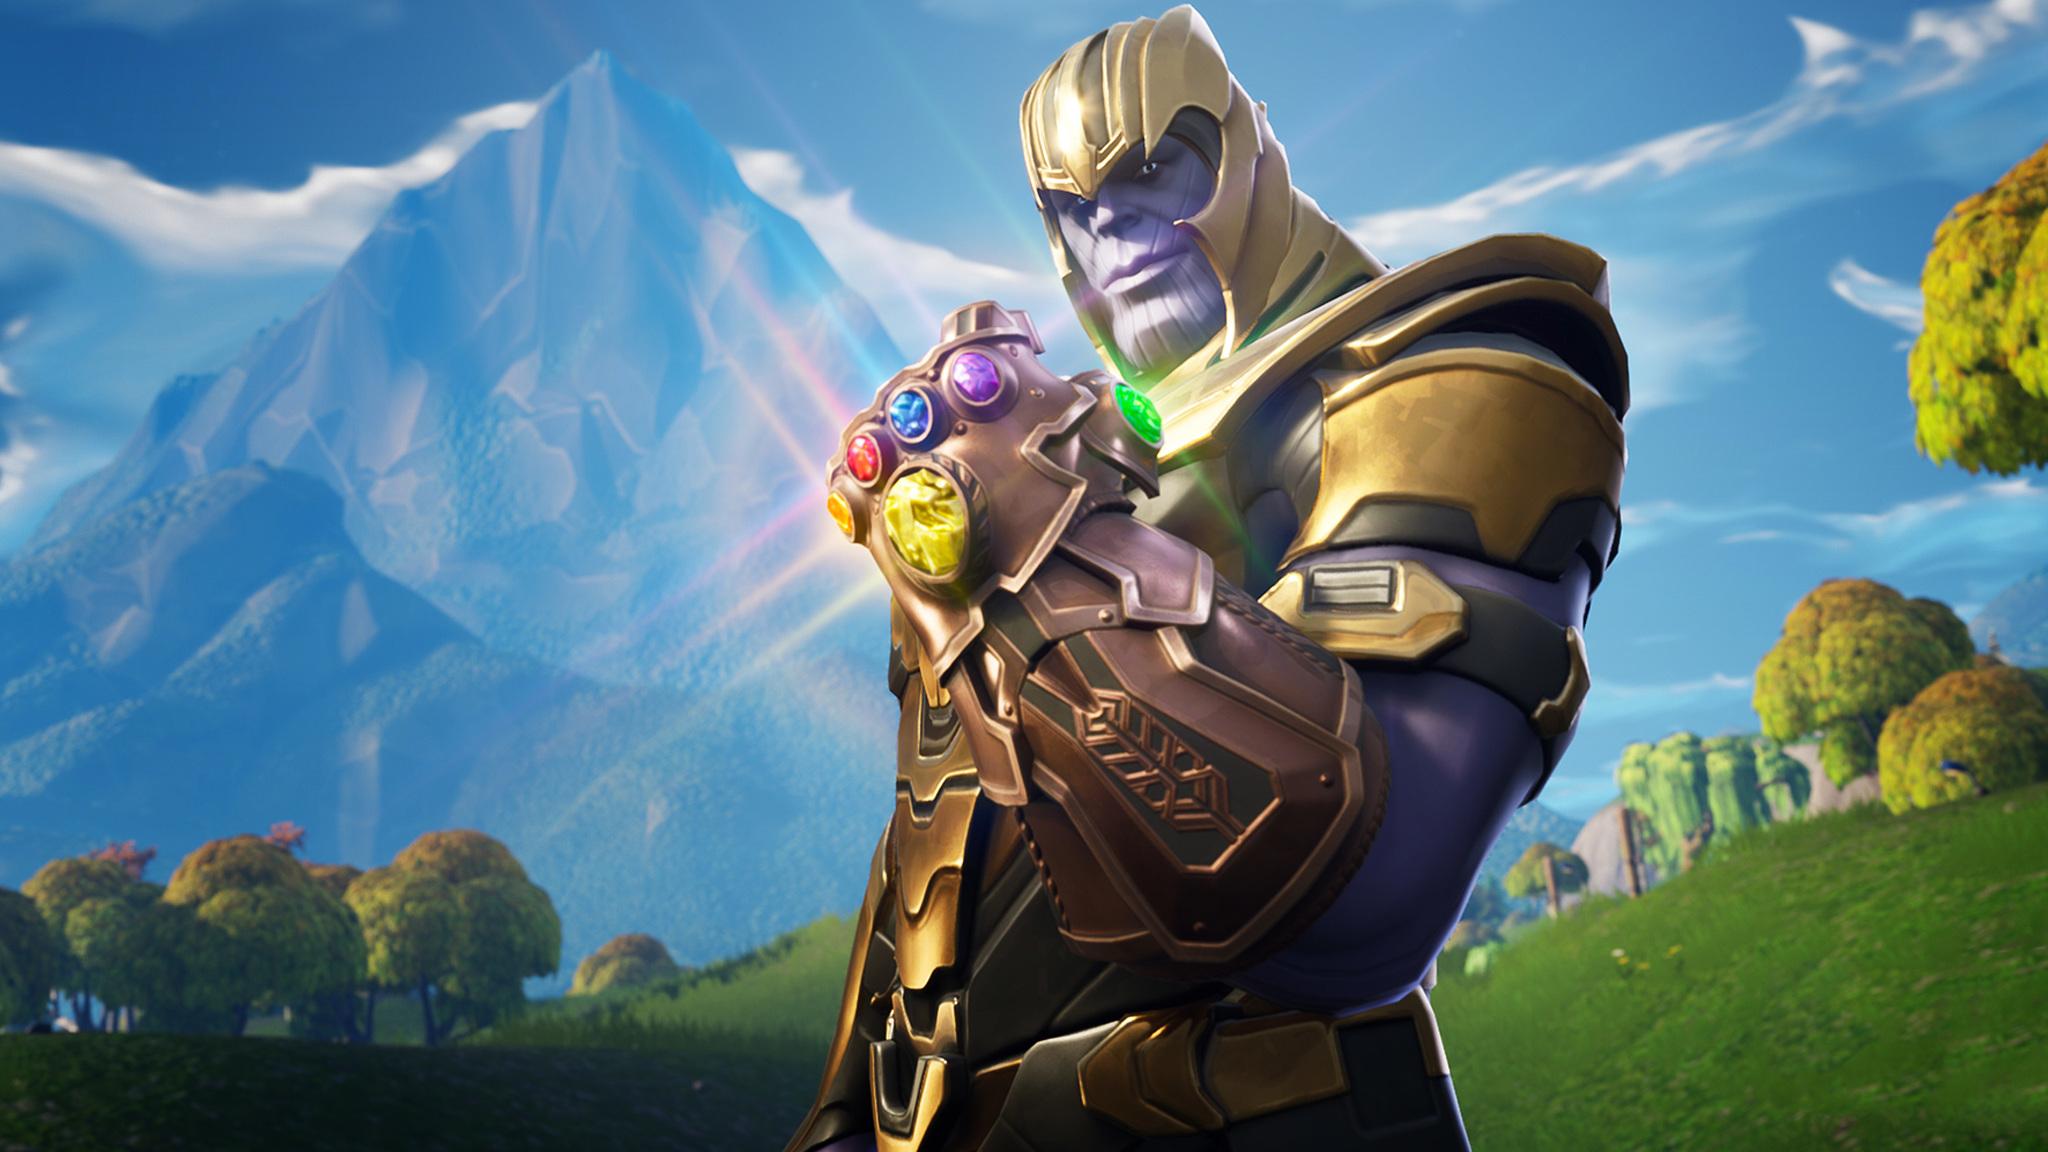 2048x1152 Thanos In Fortnite Battle Royale 2048x1152 Resolution HD 2048x1152